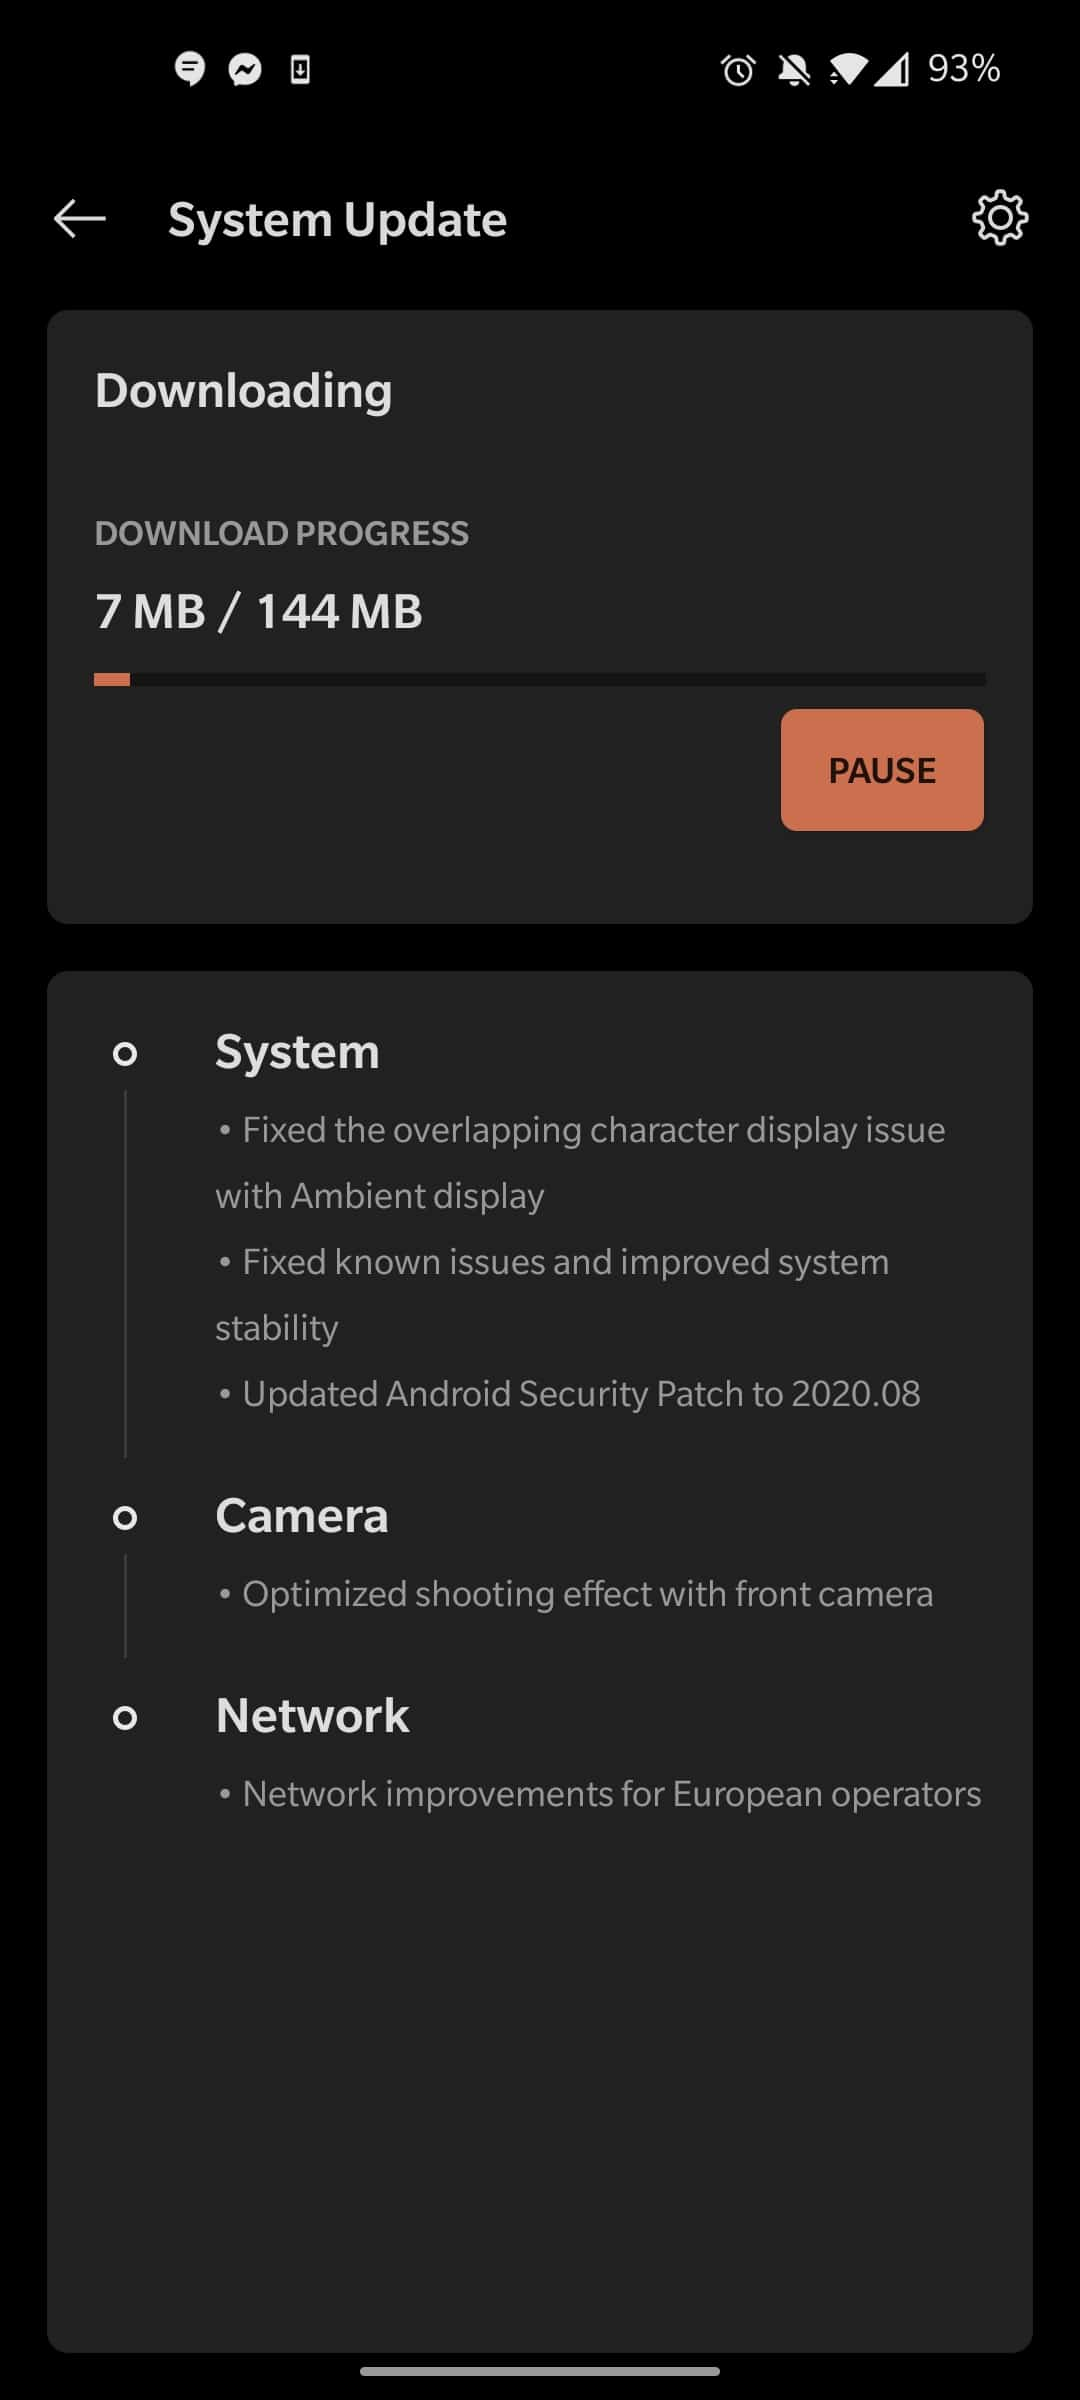 OnePlus 8 OxygenOS 10 5 11 update